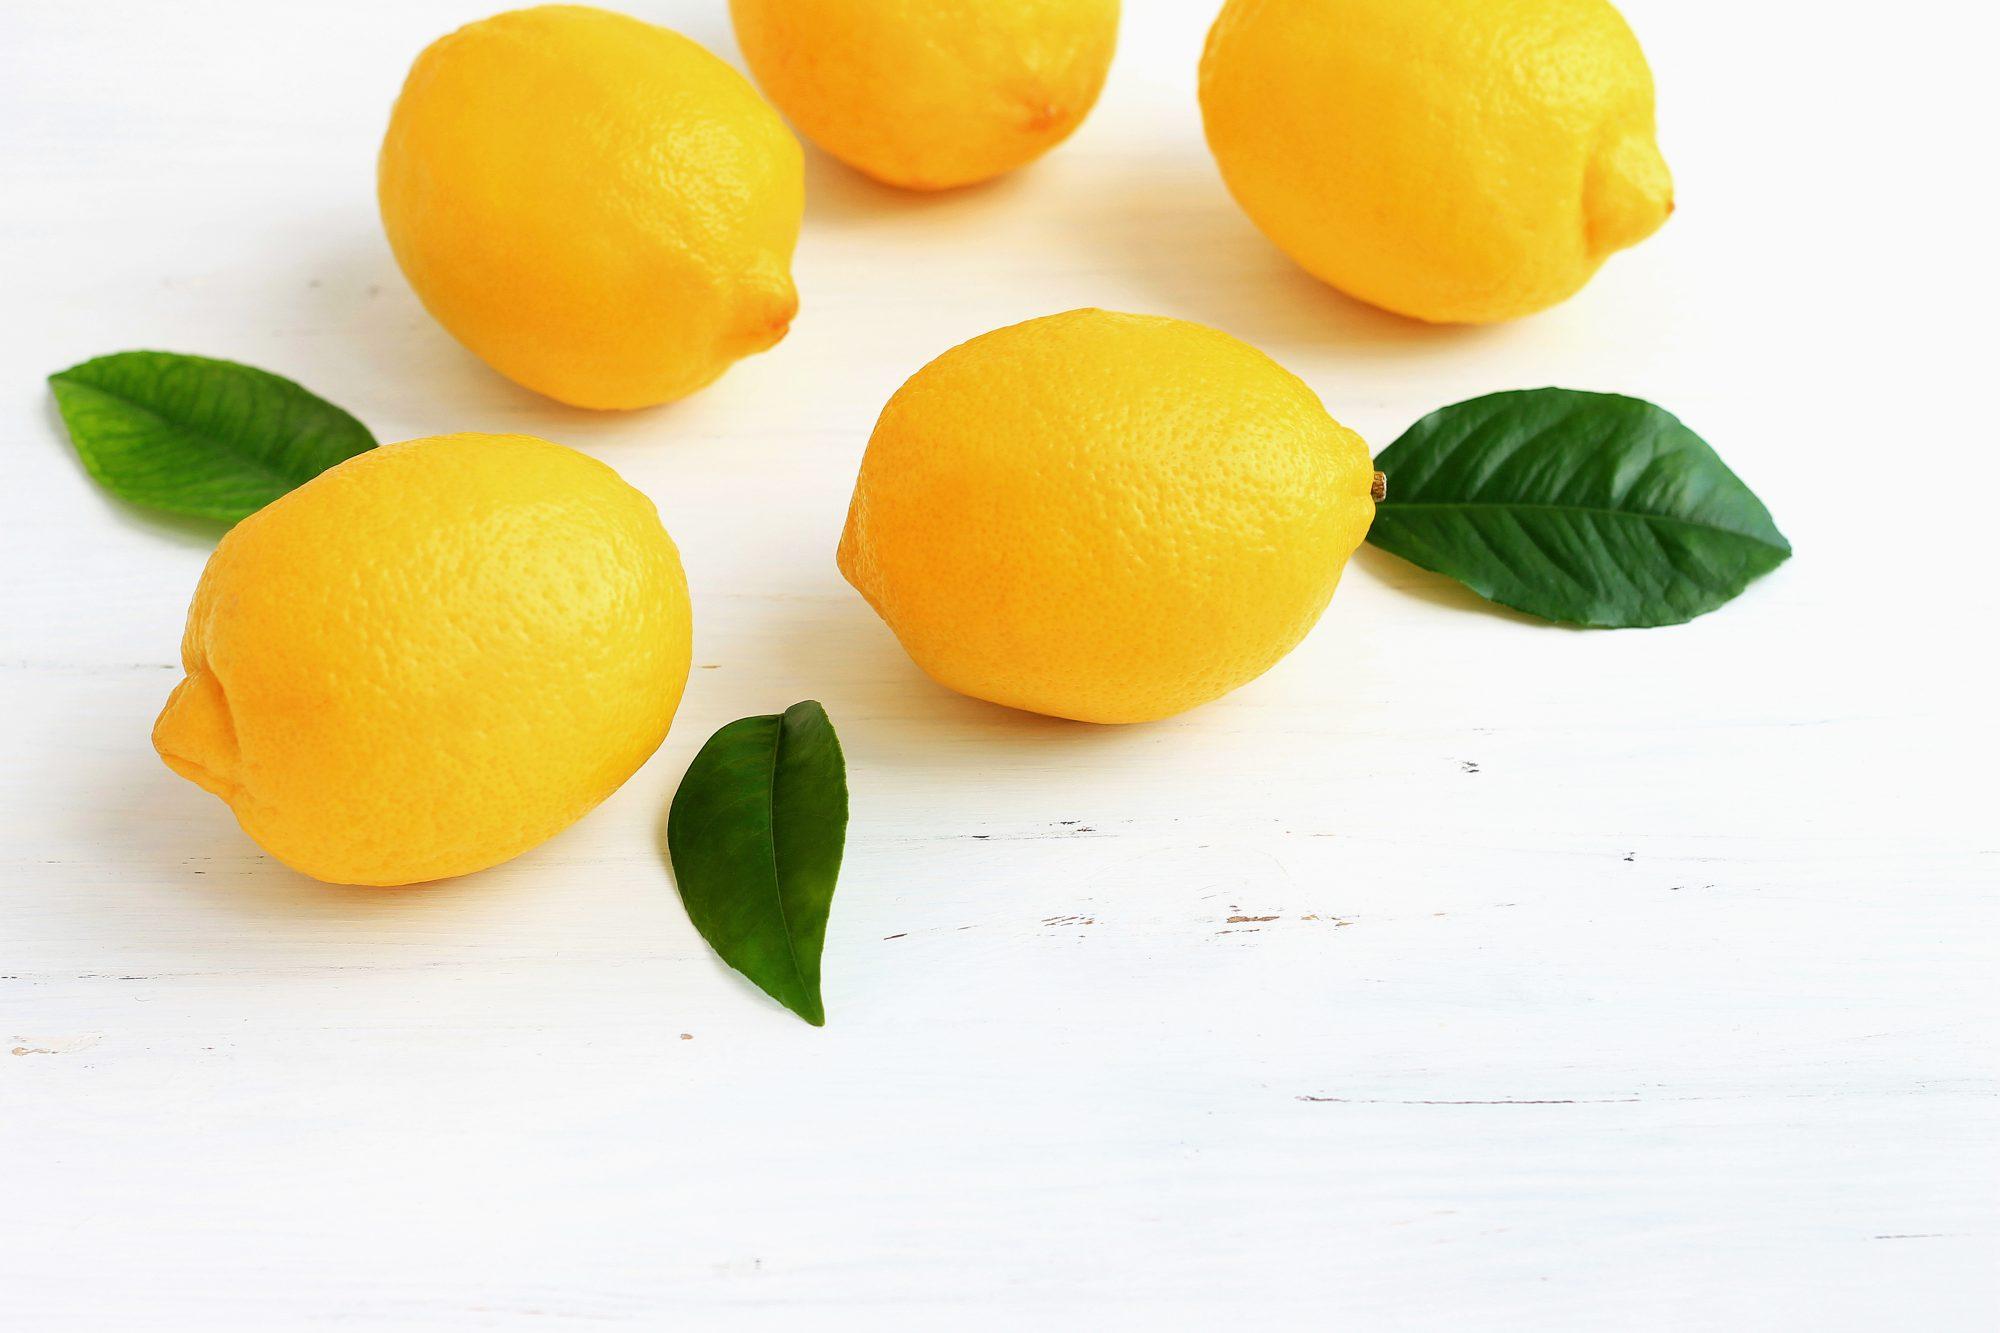 Lemons 2 Getty 4/22/20